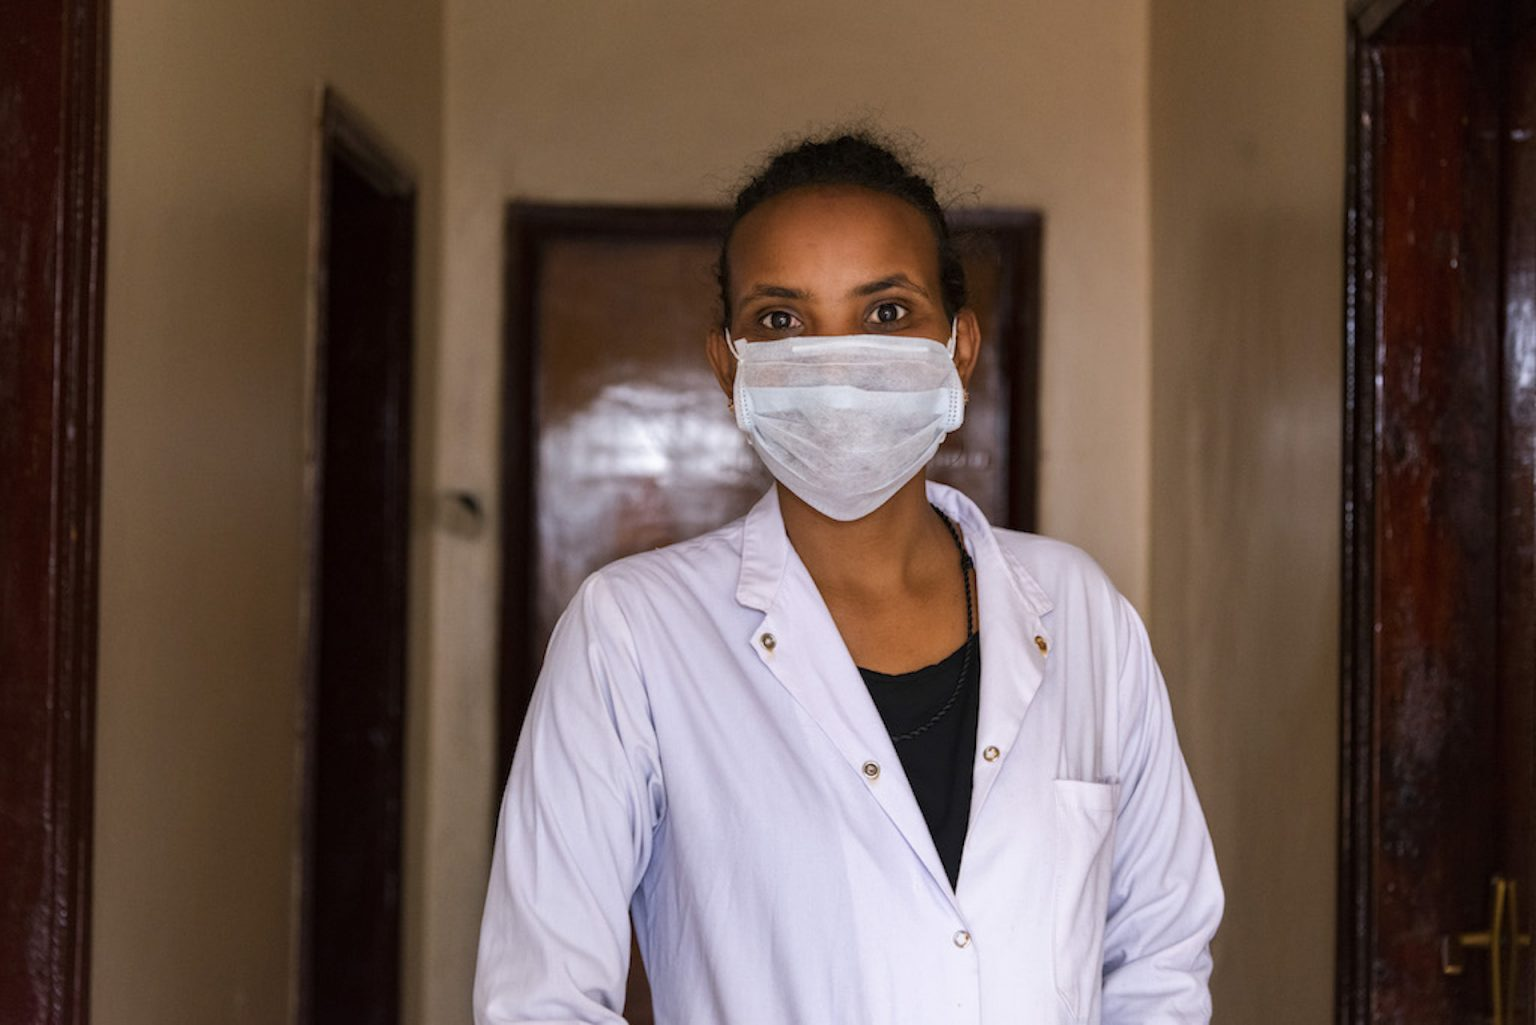 Providing medical support in Ethiopia